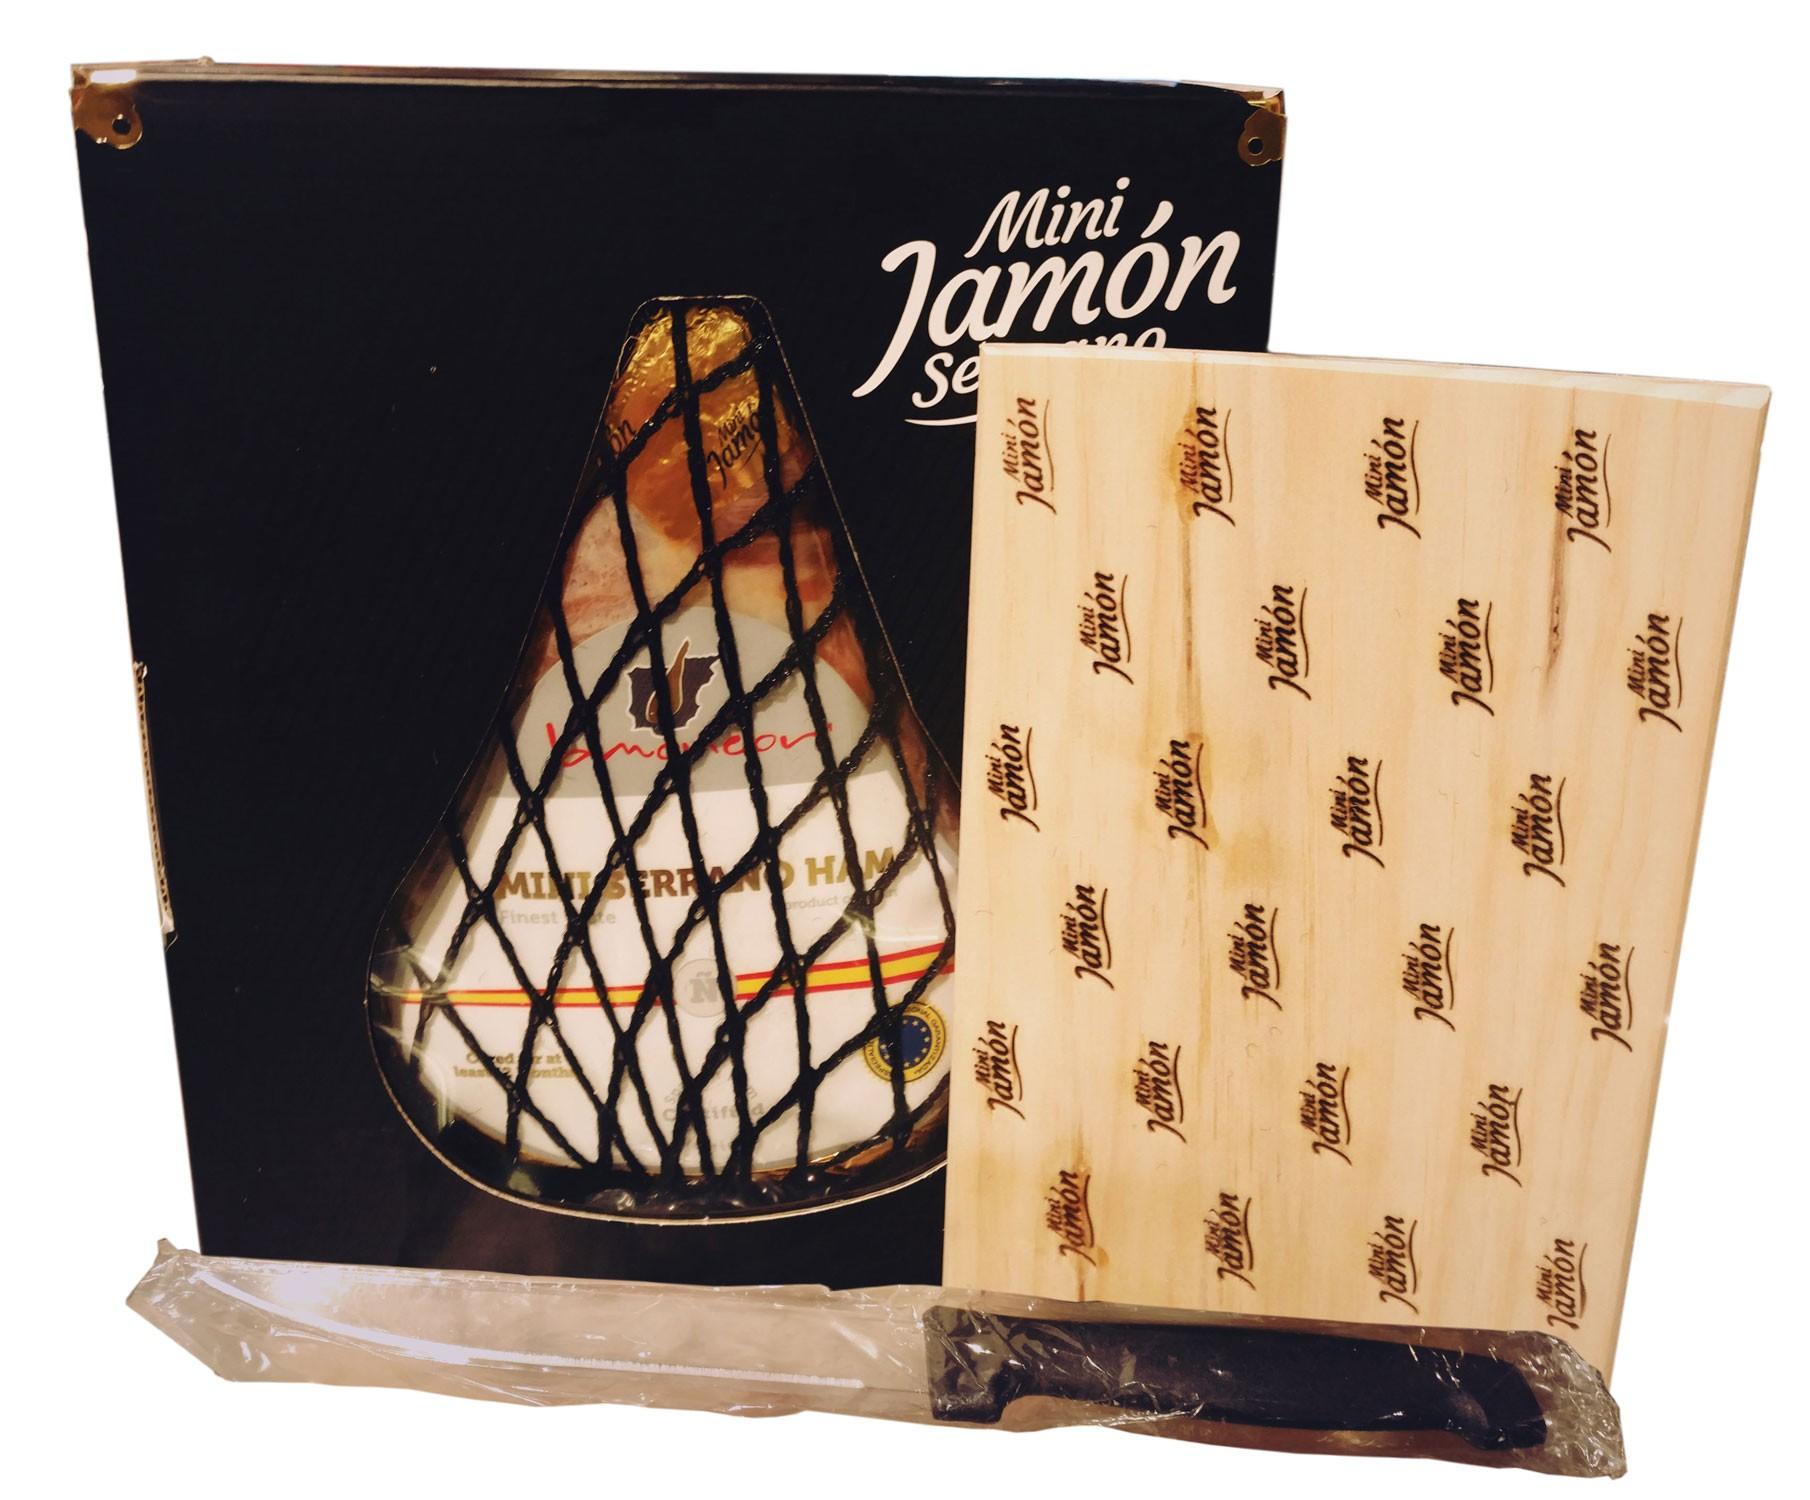 Хамон mini Serrano Jamondor с доской для нарезания и ножом фото